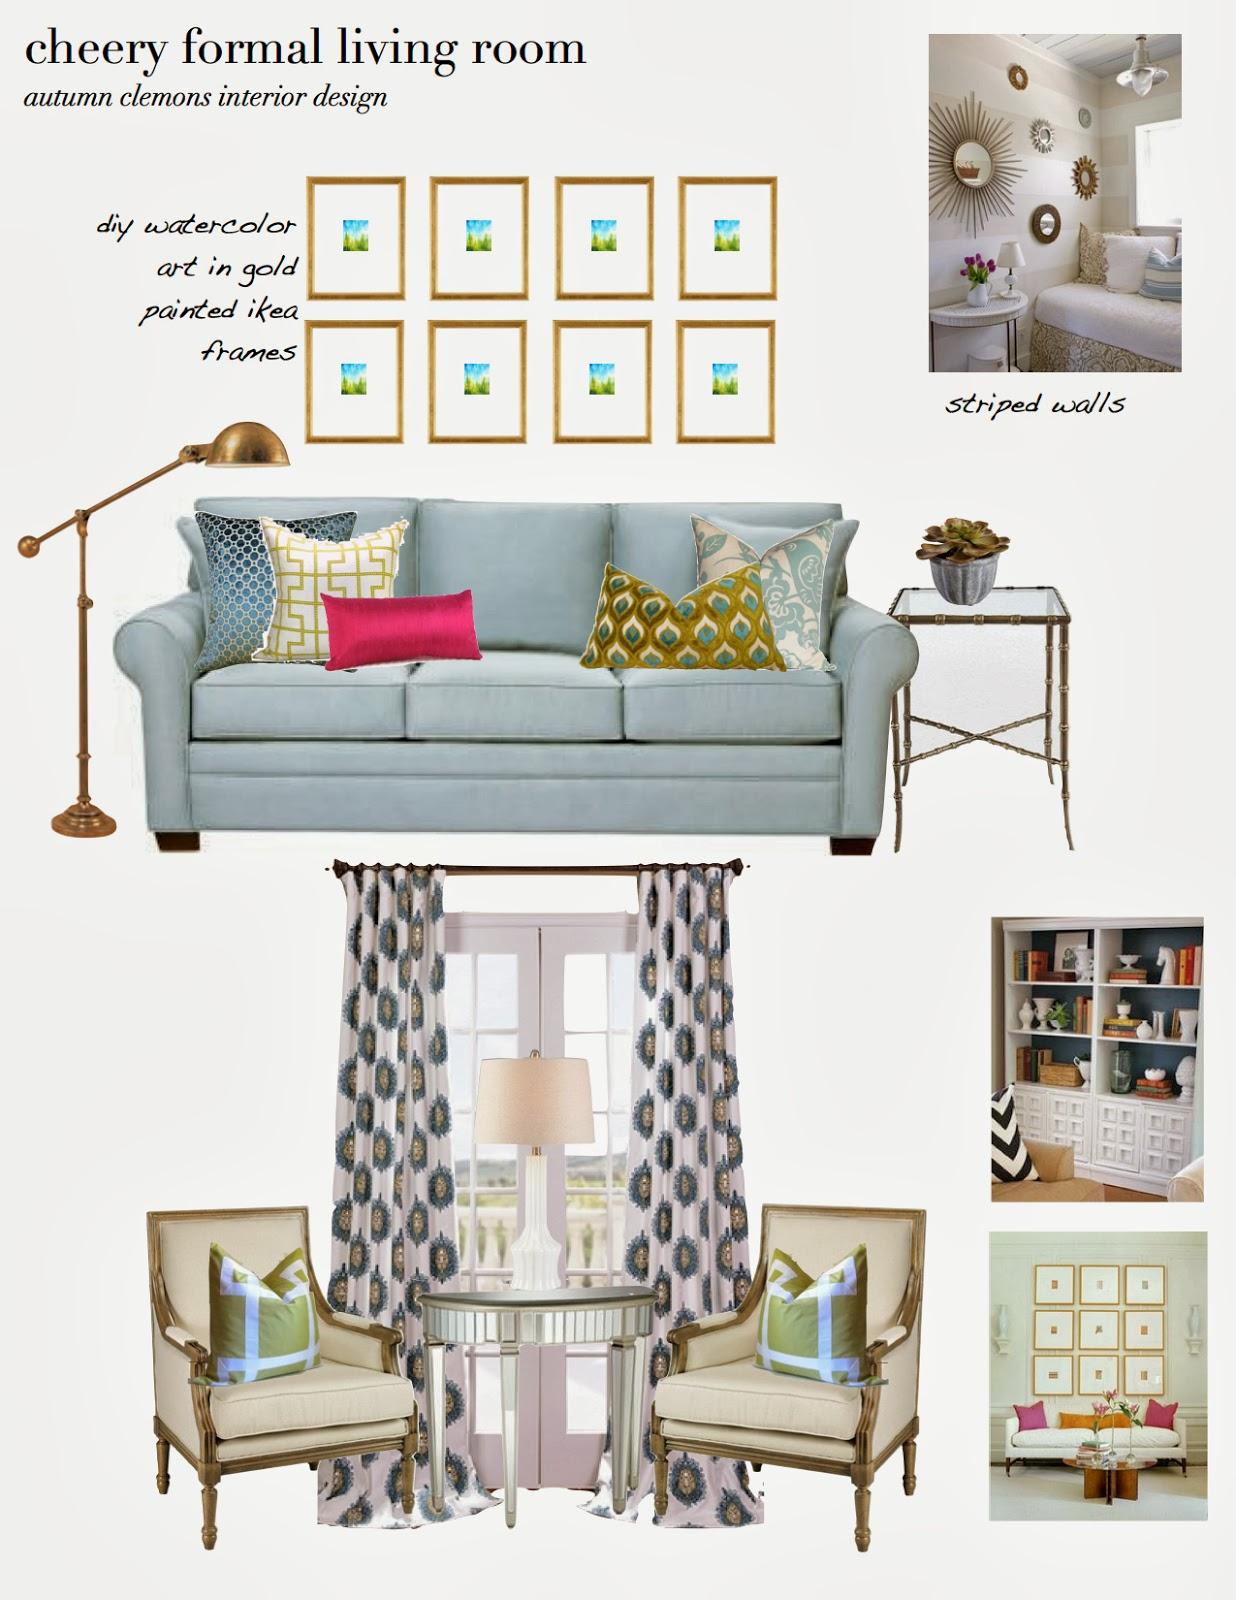 design dump: design plan: cheery formal living room